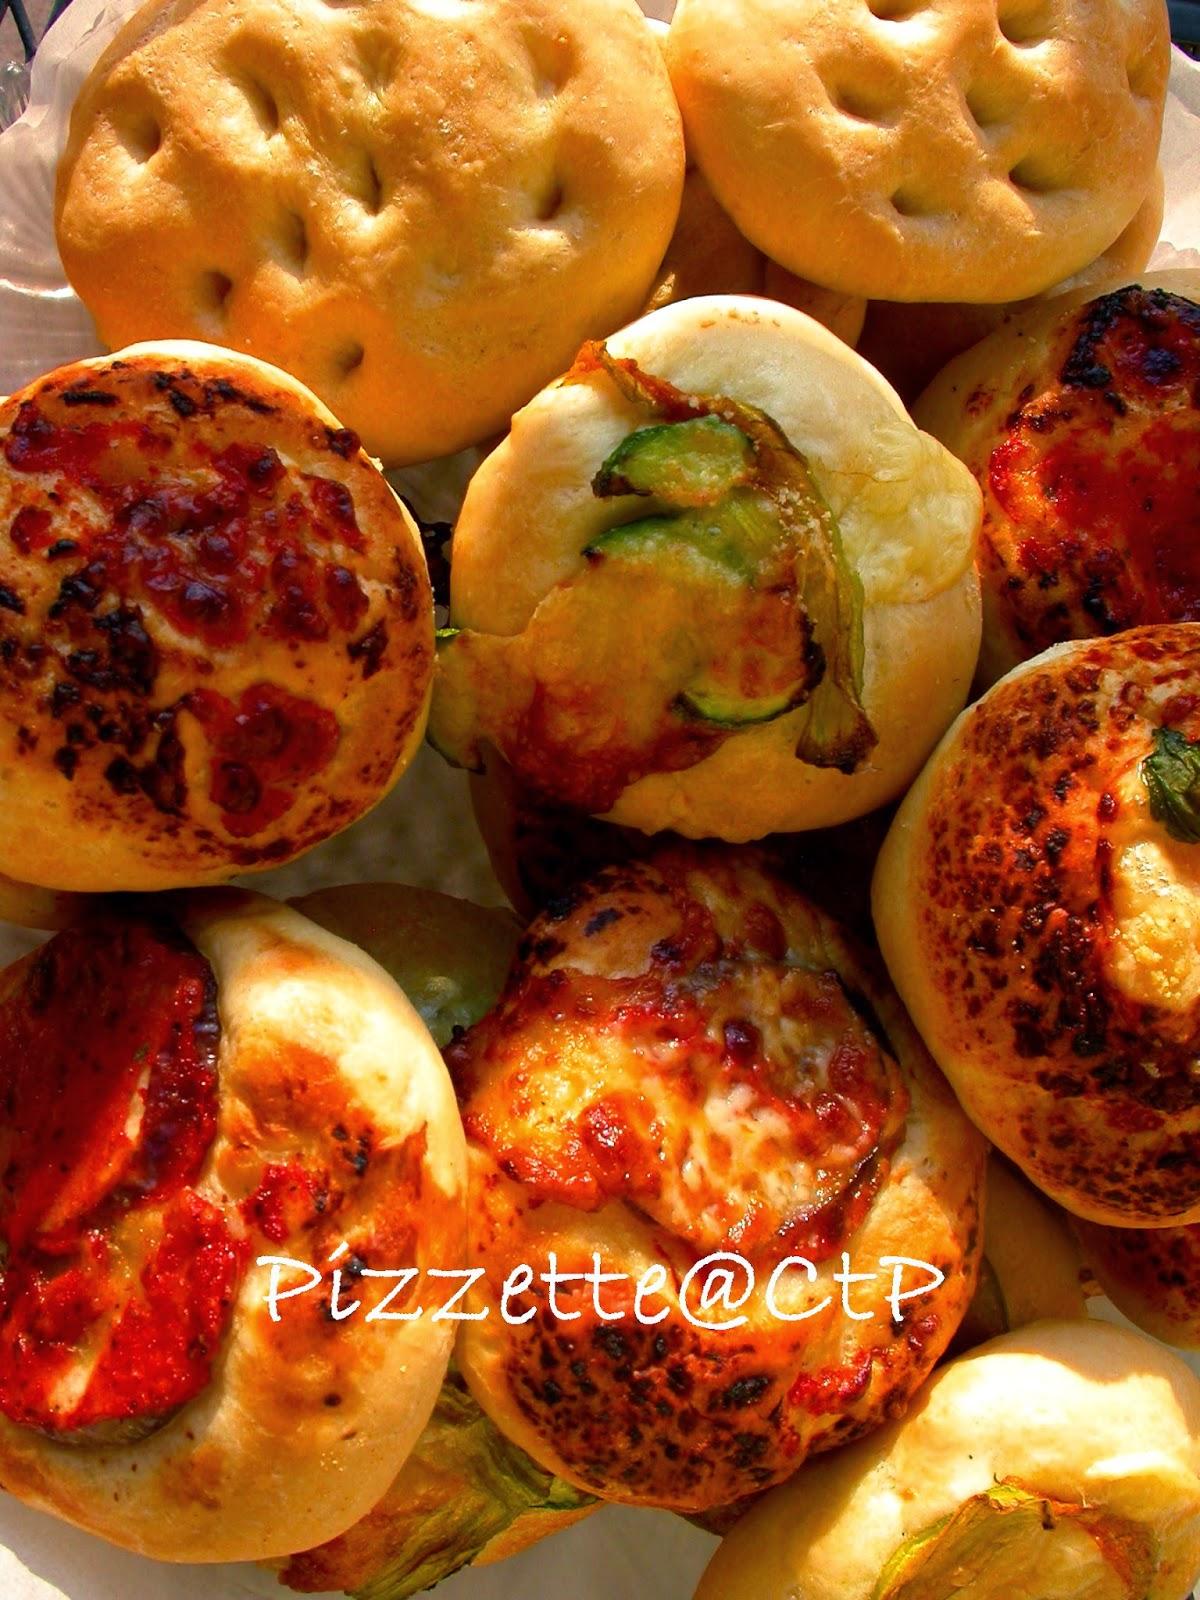 pizzette pomodoro mozzarella zucchine melanzane